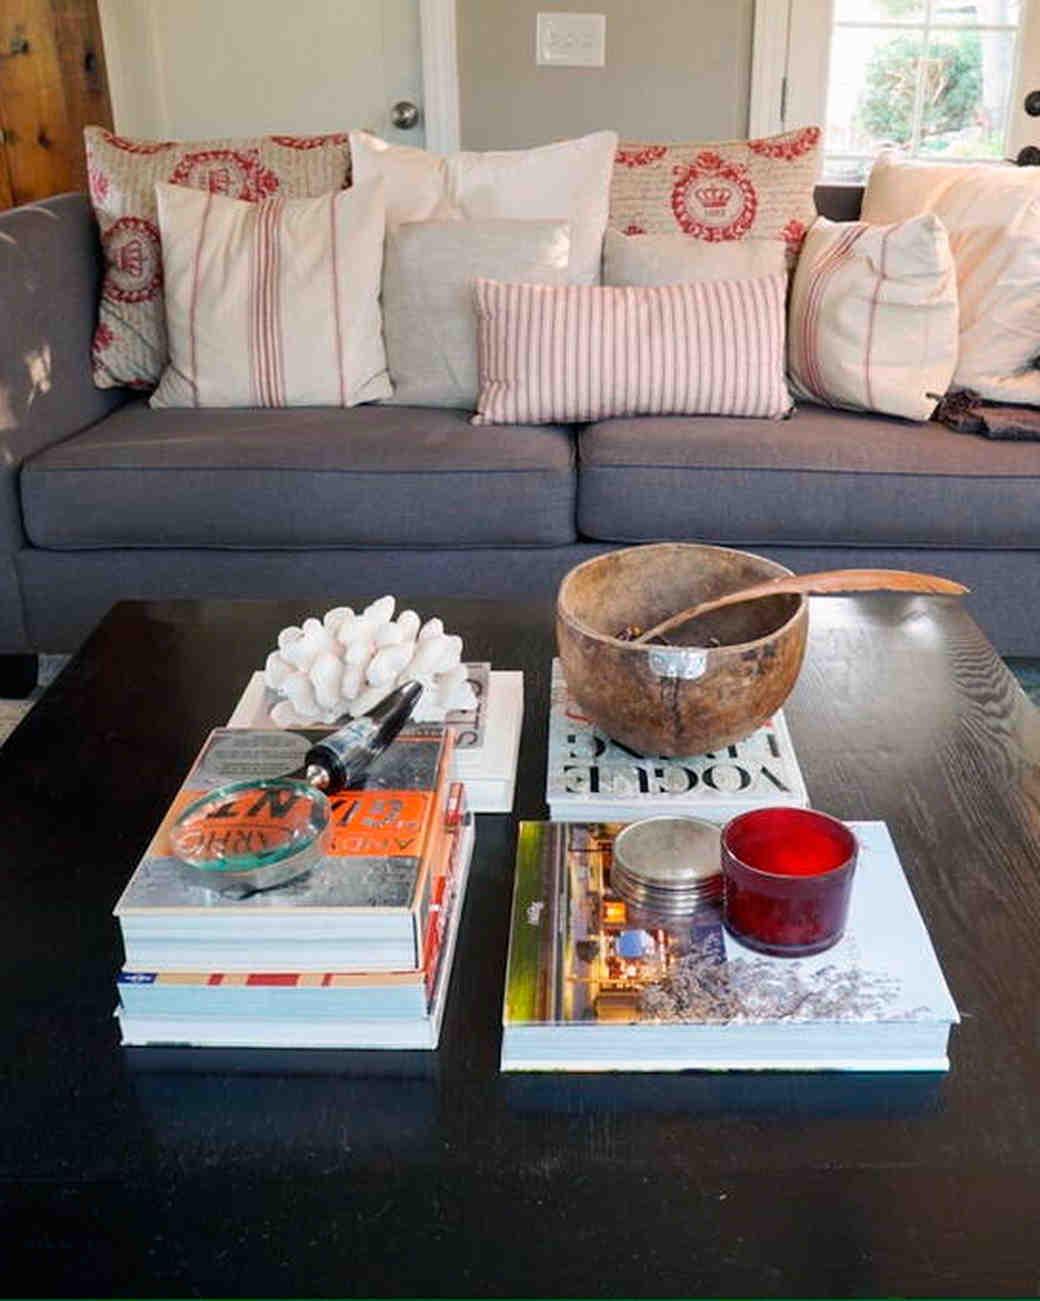 bachelorette-party-destinations-napa-california-airbnb-1215.jpg